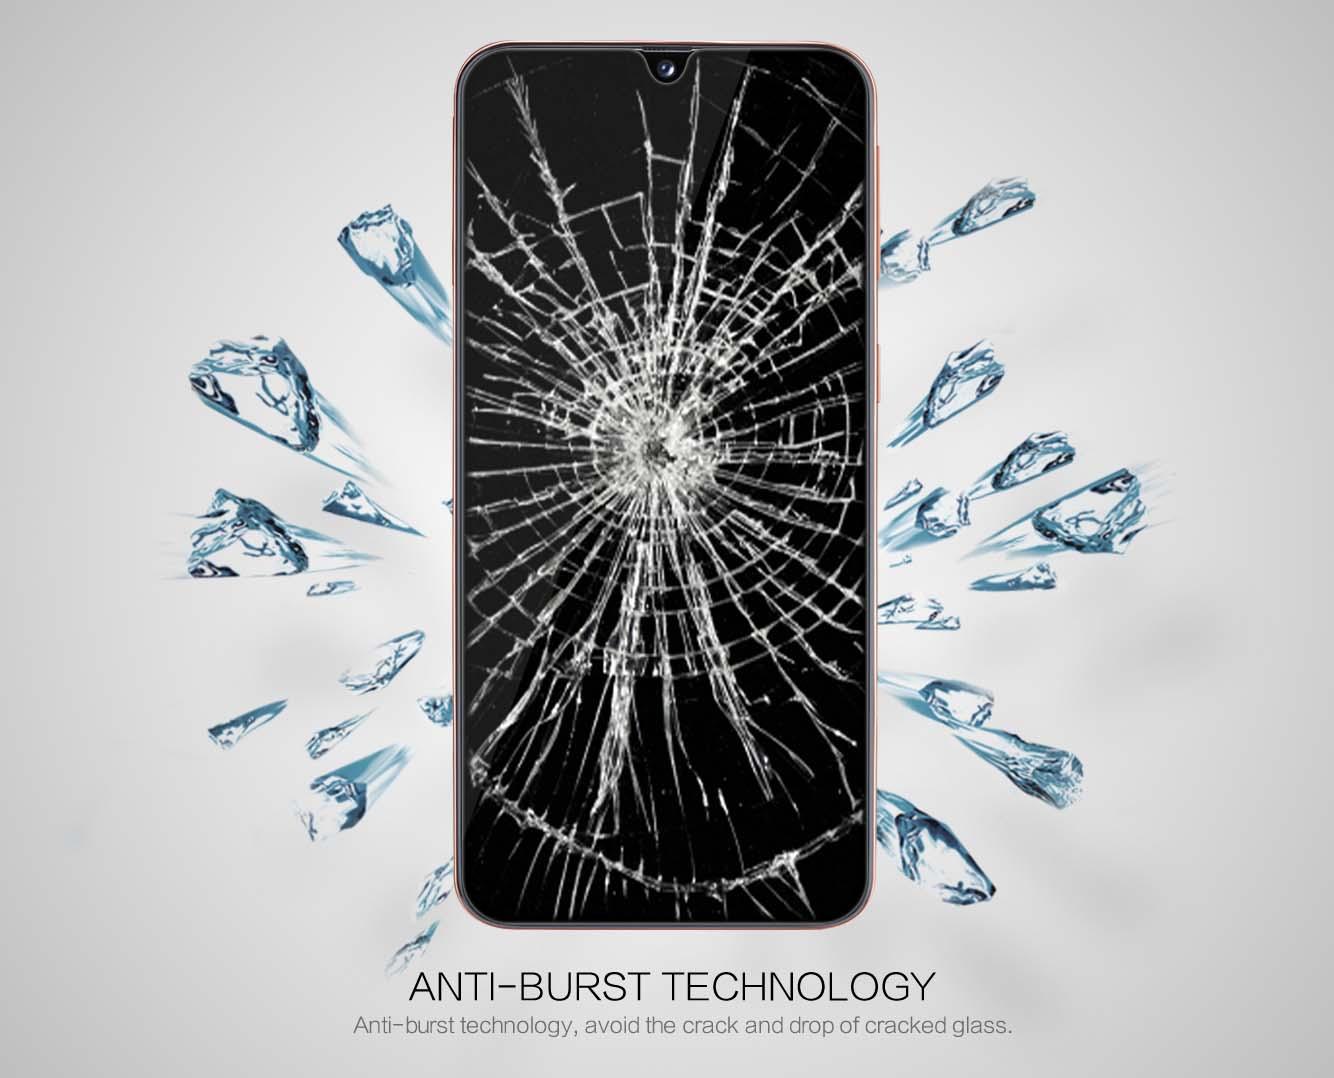 Samsung Galaxy A40 screen protector